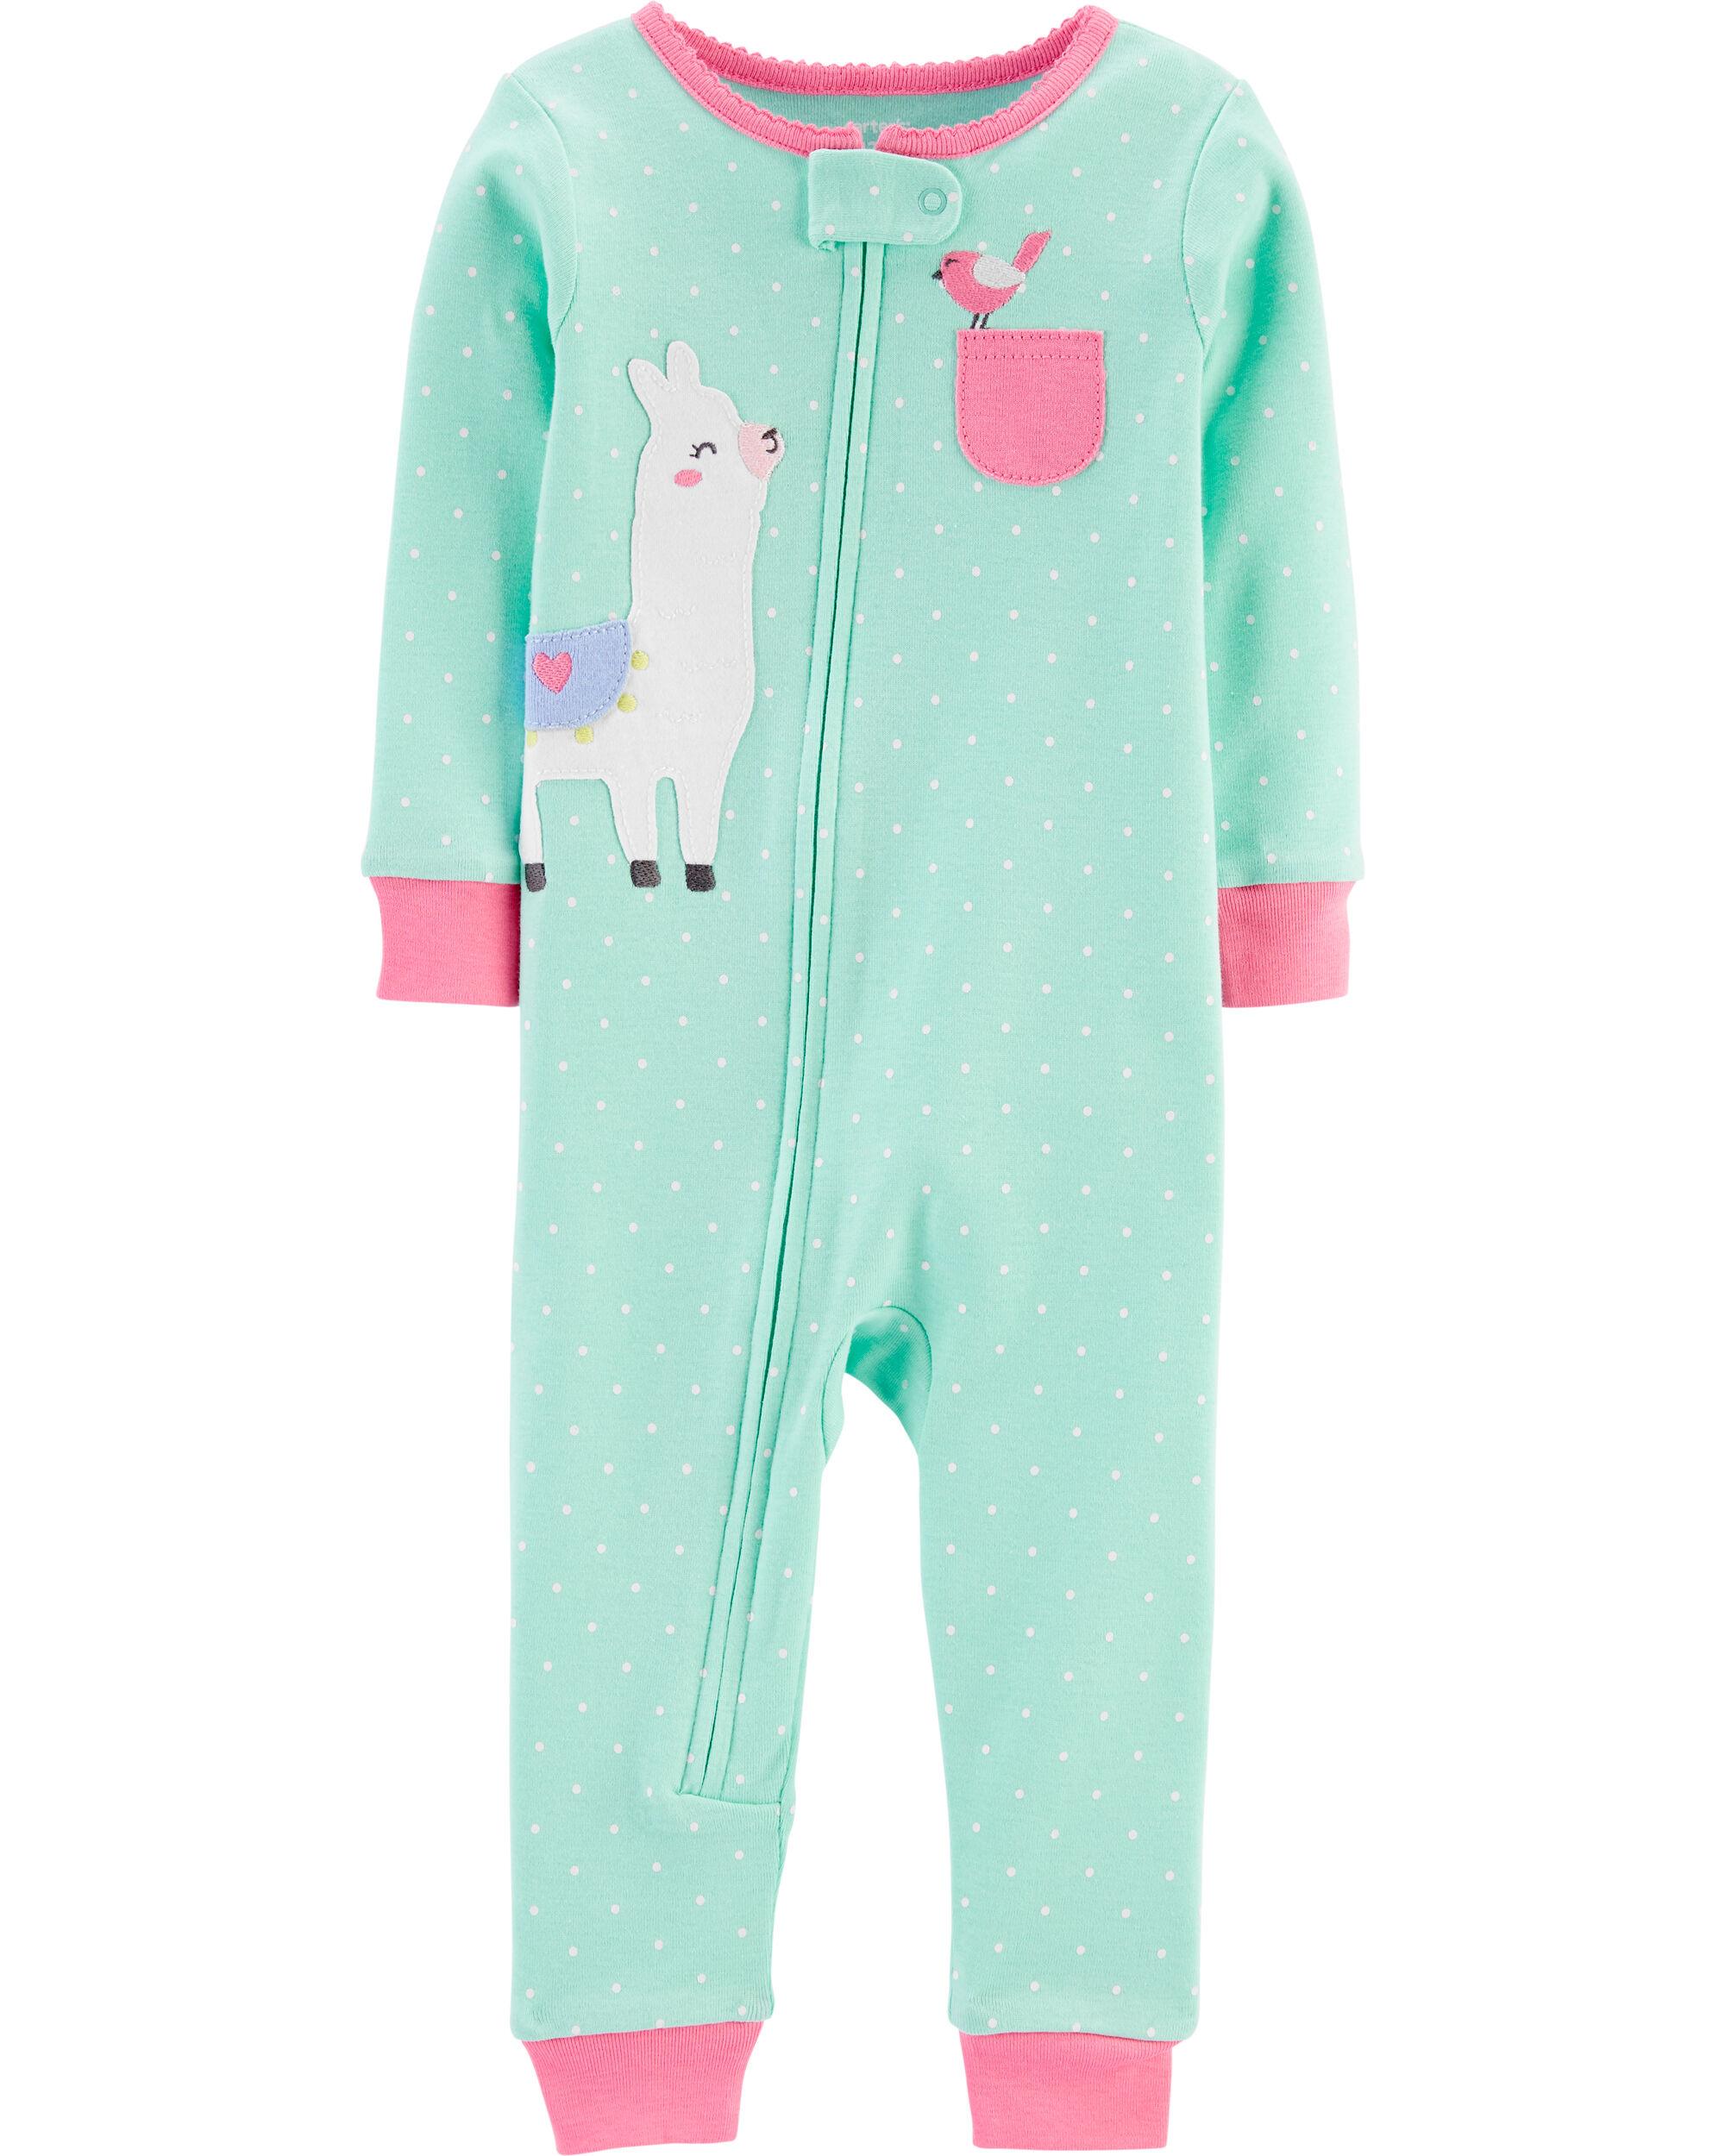 NWT Carters Flamingo Toddler Girls Cotton Footless Sleeper Romper Pajamas